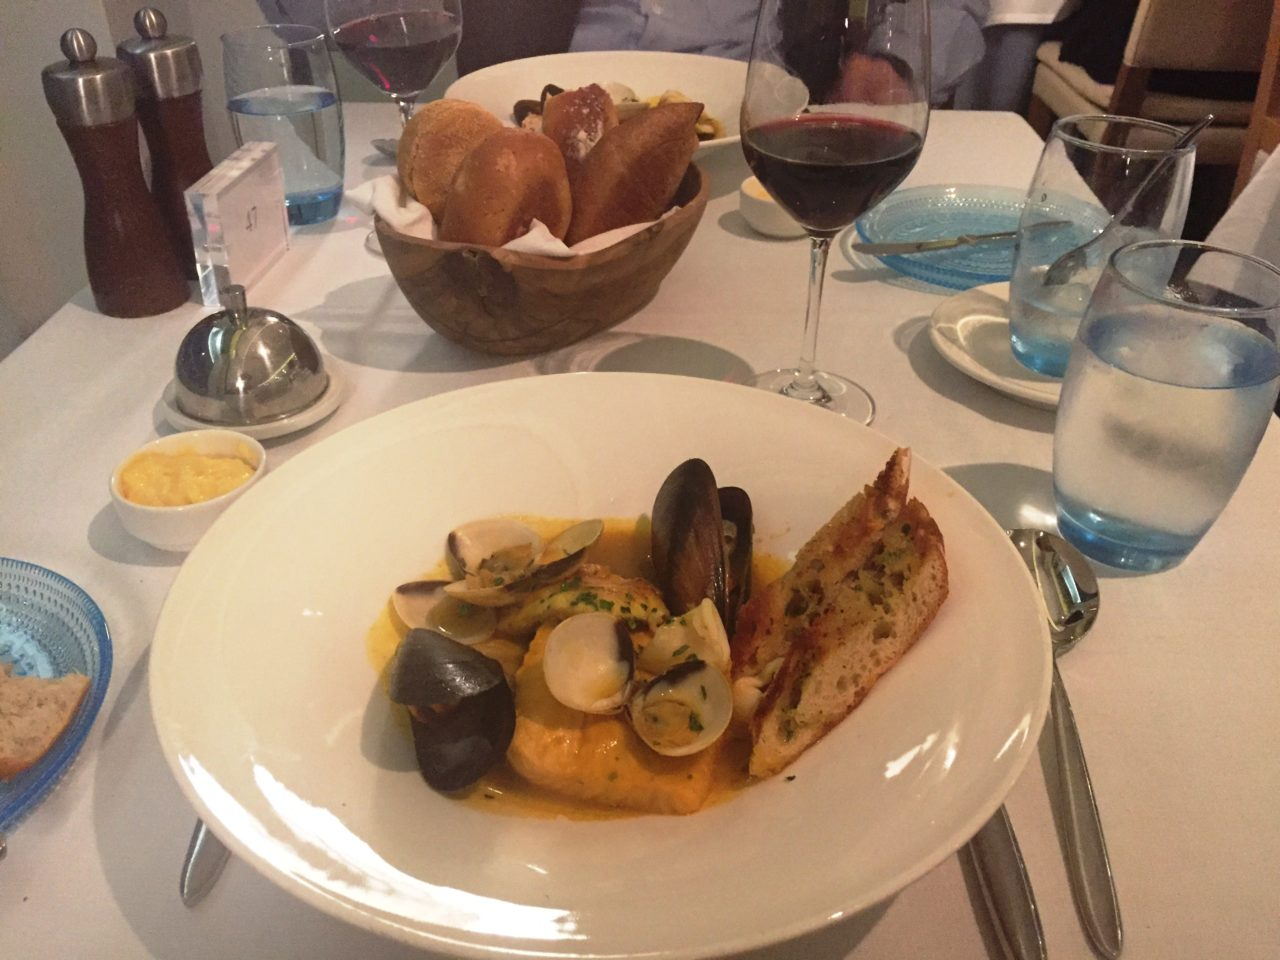 <em><strong>Viking Ocean Cruise Ships ~</strong> </em> Bouillabaisse Toulonnaise in the Restaurant of the Viking Star